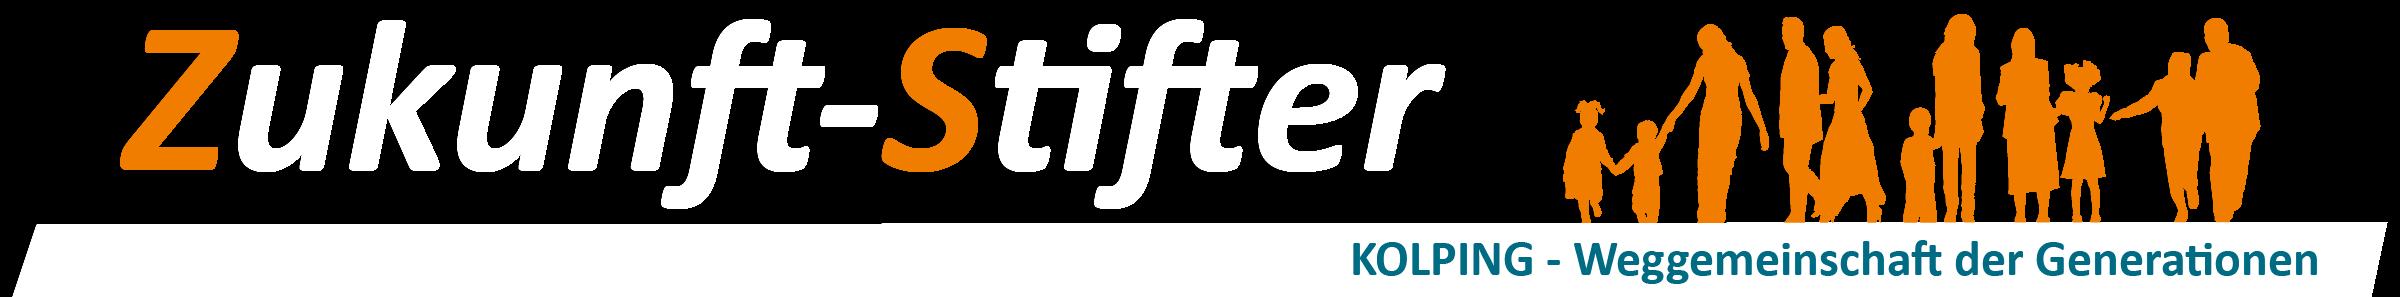 Zukunft-Stifter